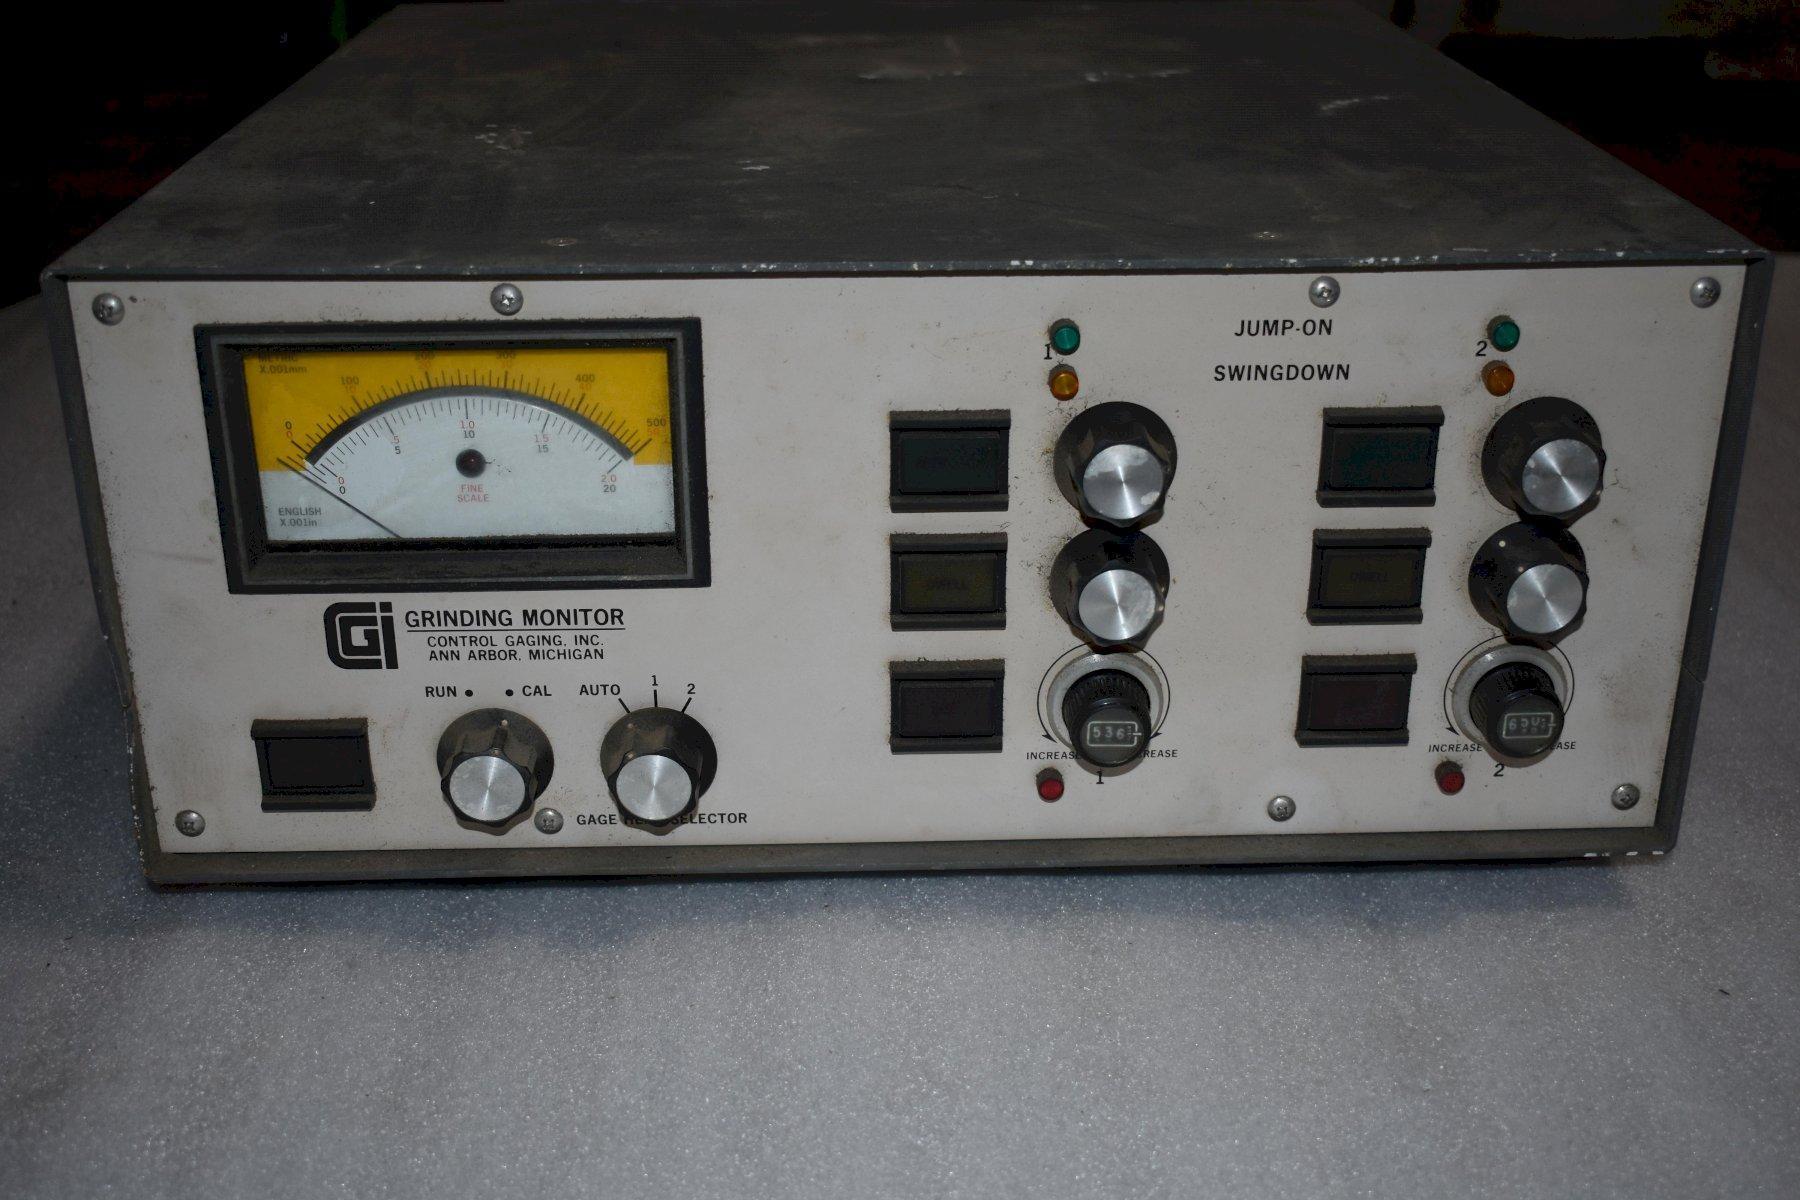 Control Gaging Inc Grinding Monitor, Model 801N-310AD-22MG, Part # 042106.